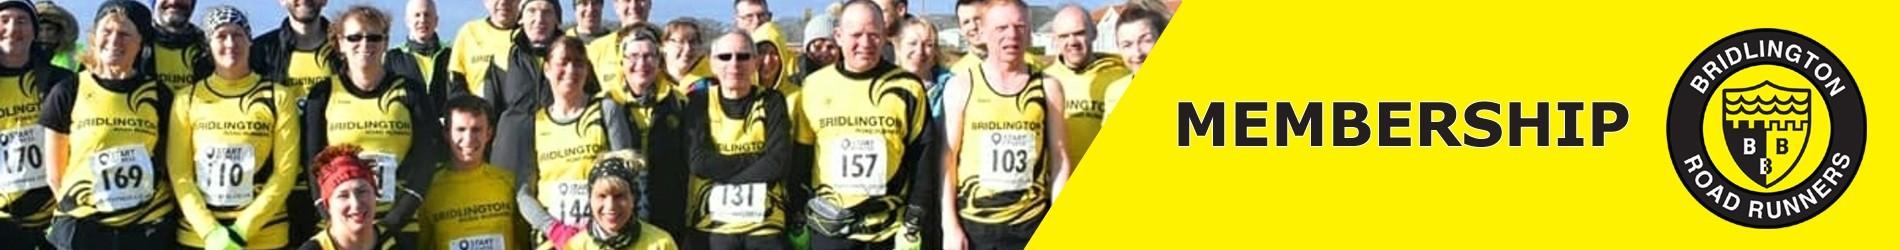 Bridlington Road Runners Season 2021-22 Membership